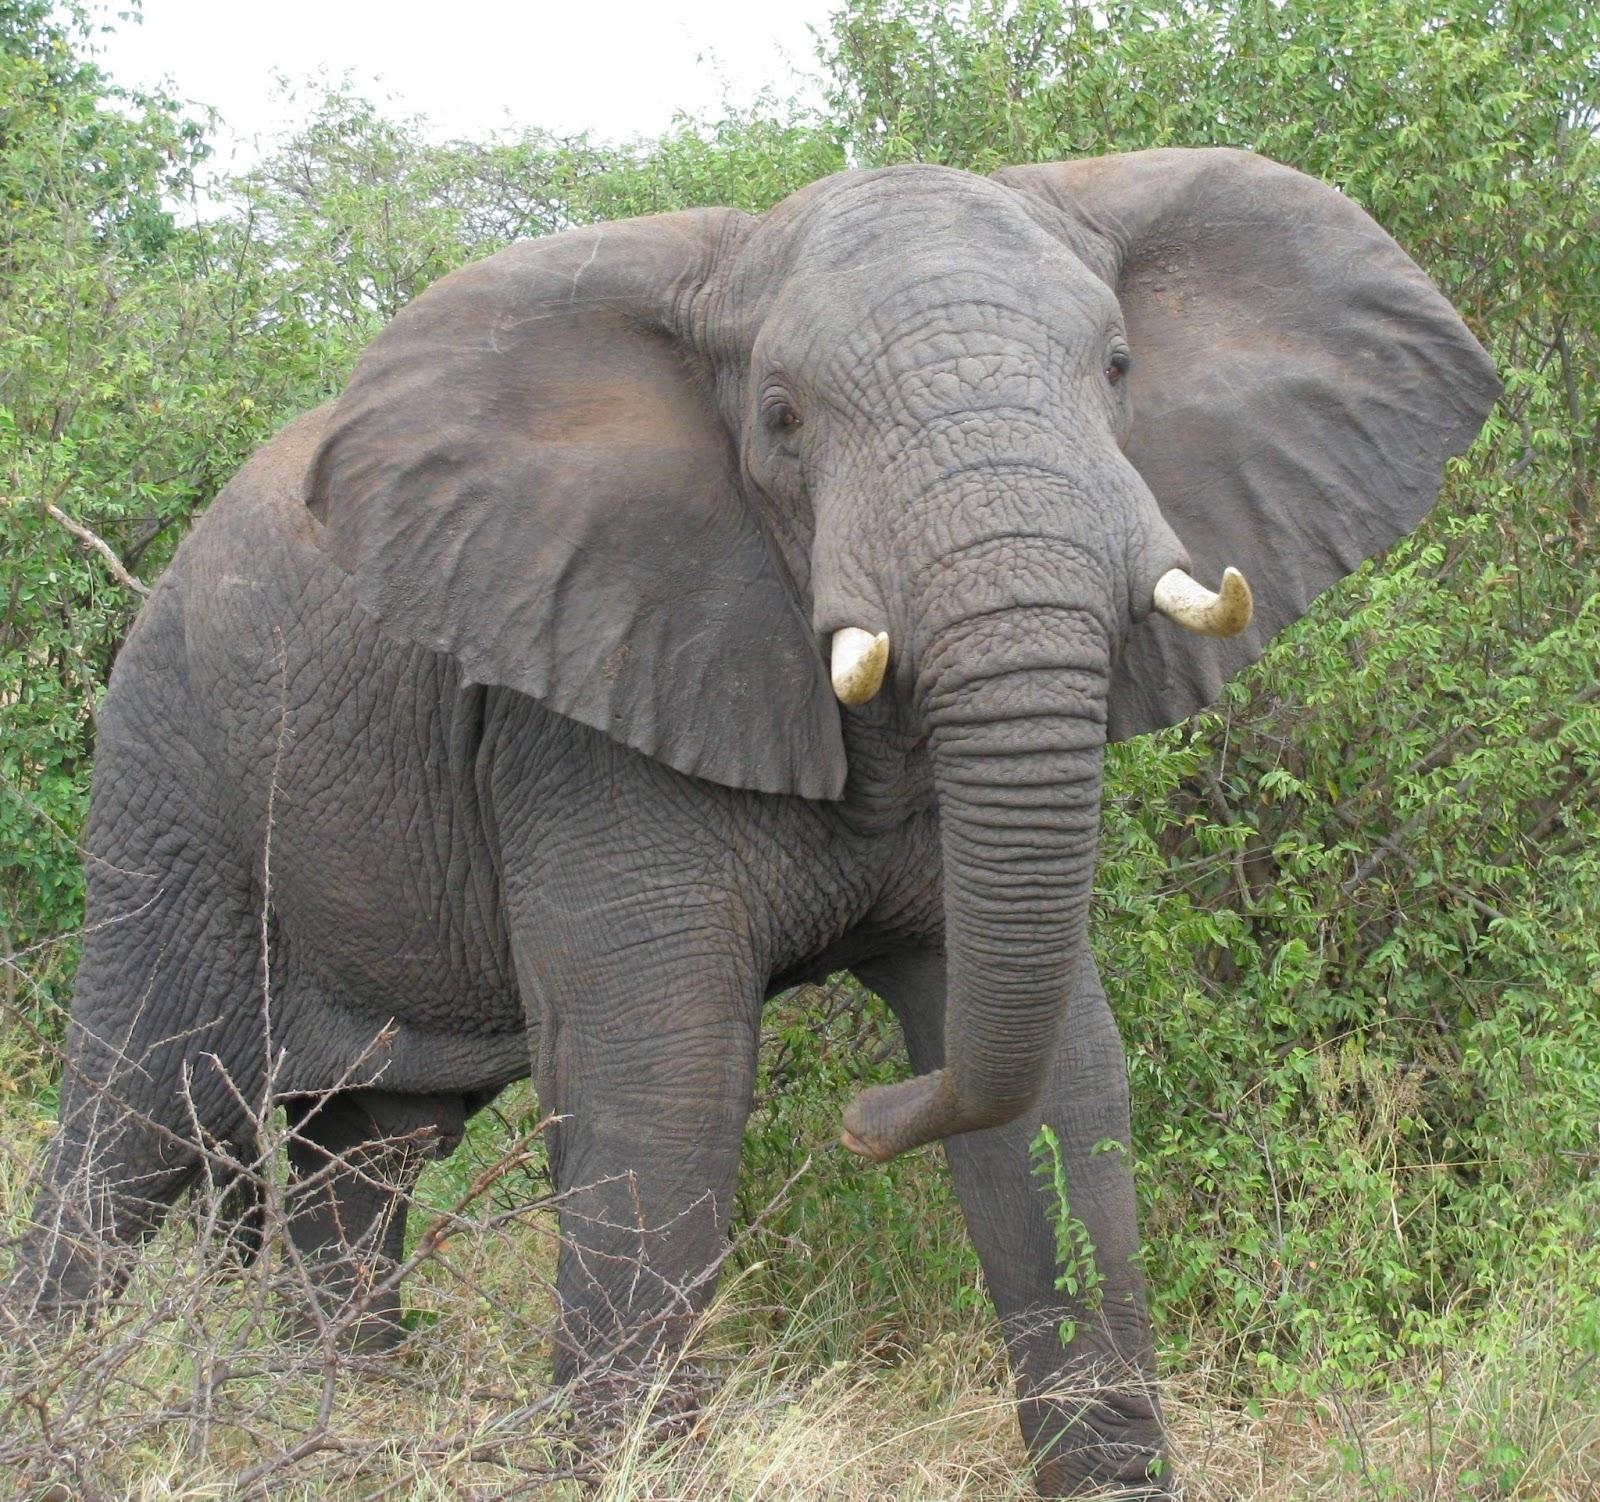 Fantastica Animal: The African Elephant